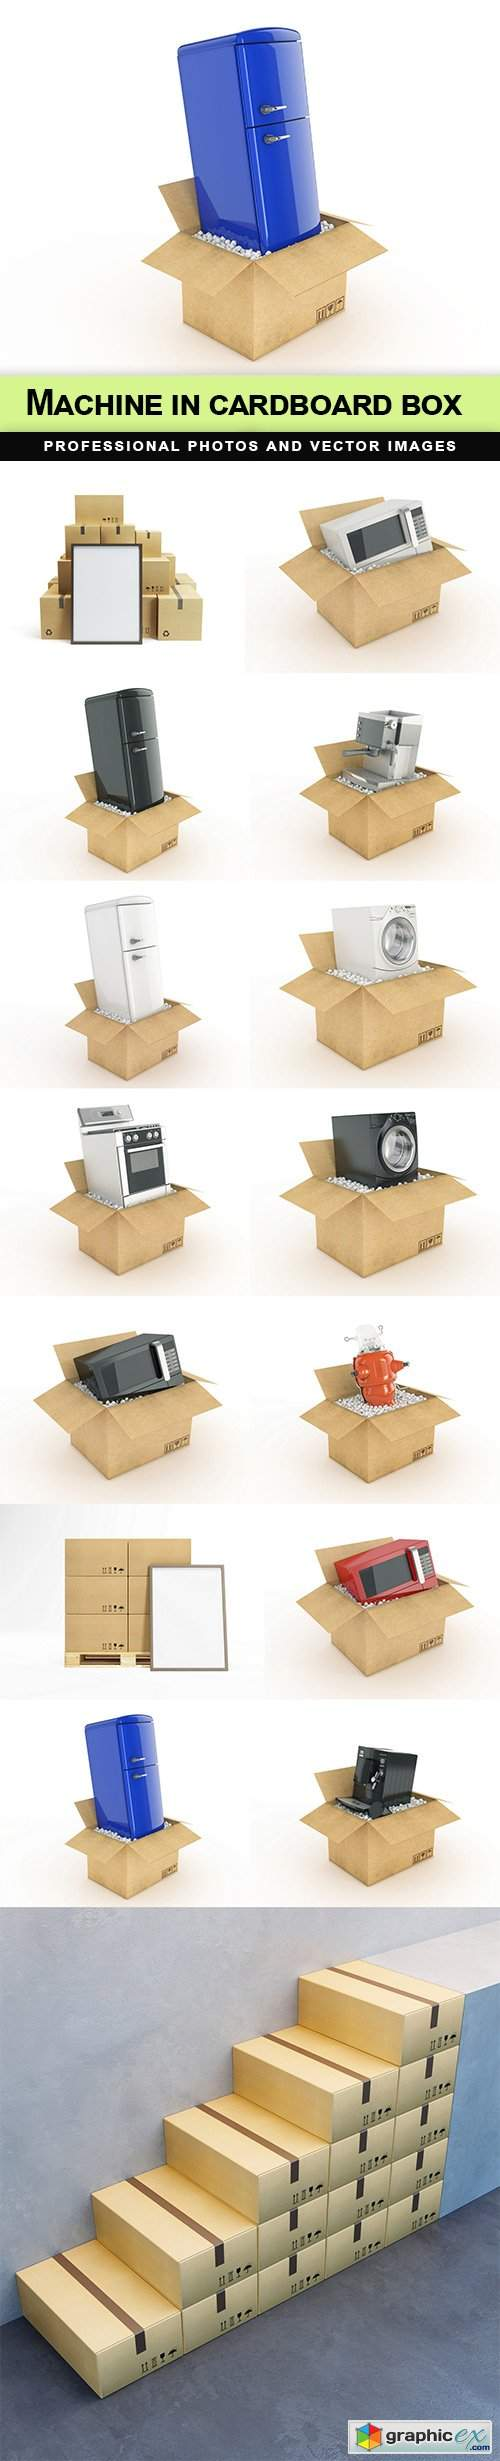 Machine in cardboard box - 15 UHQ JPEG